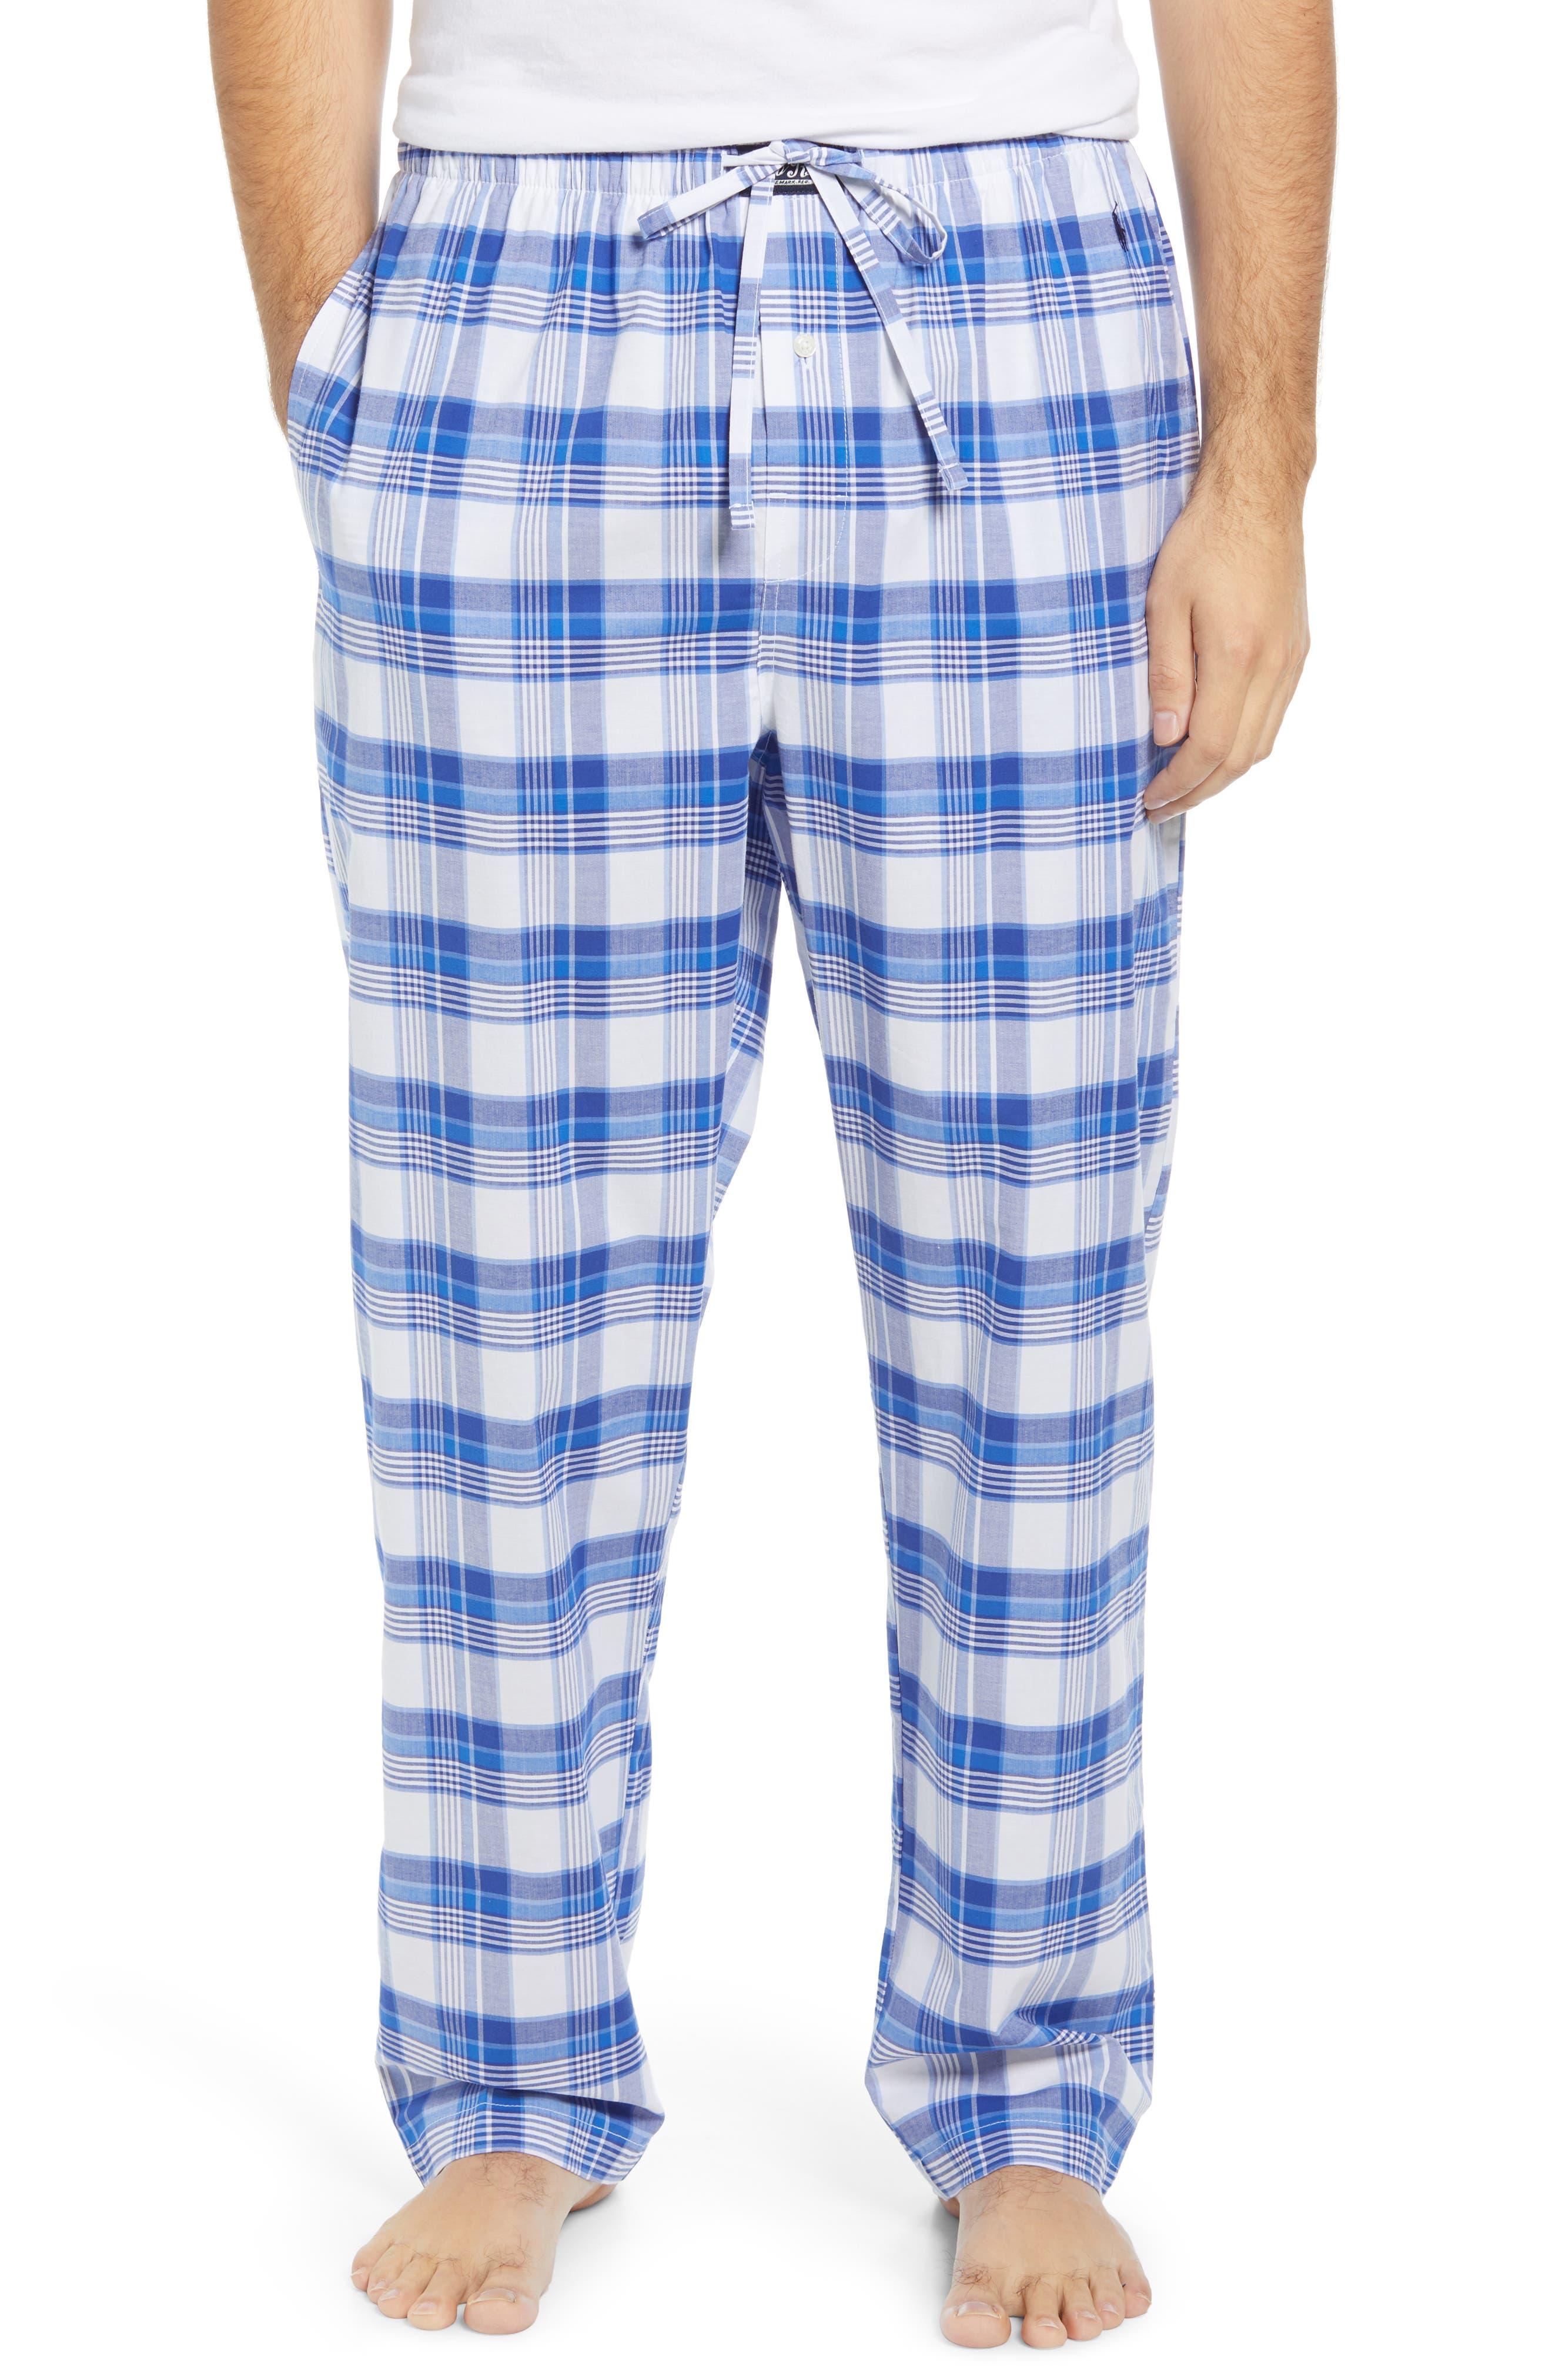 Trueboy Mens Adults Gents Nightwear Pyjama PJ Lounge Bottoms Pants Shorts